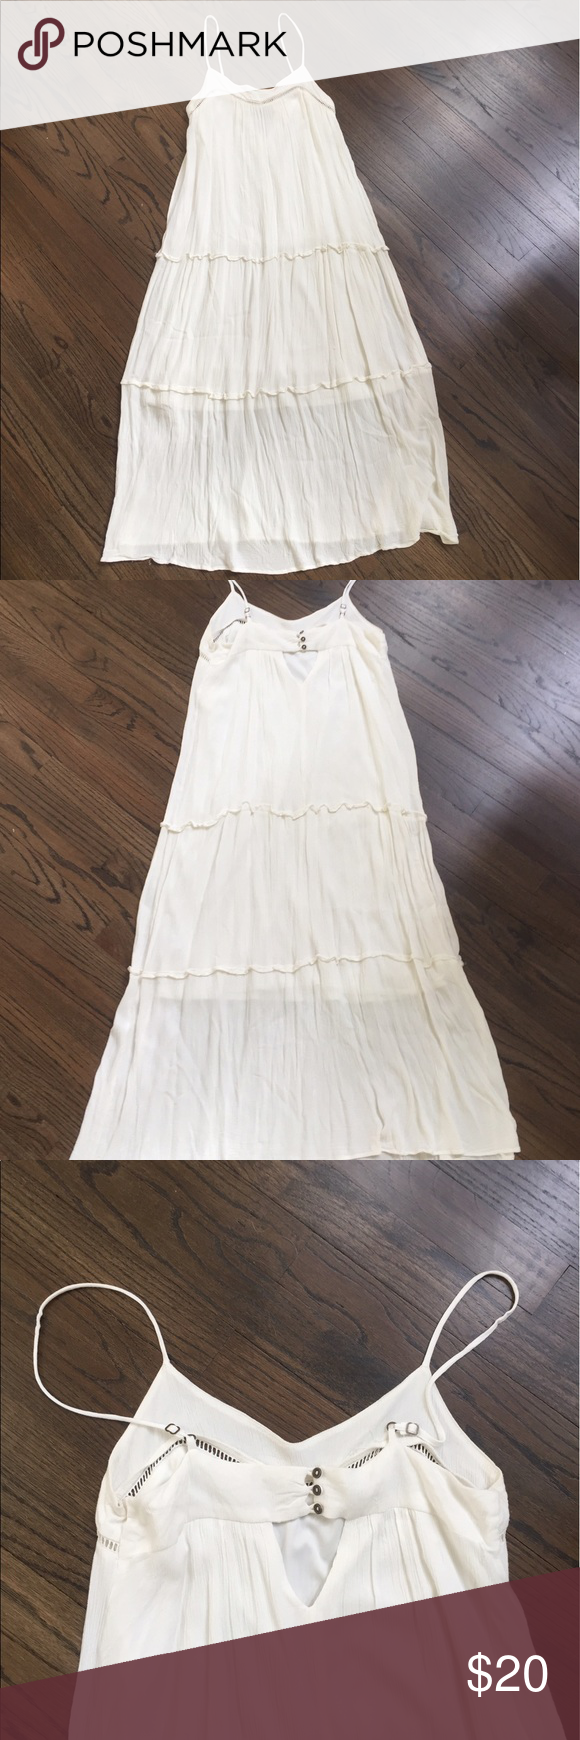 White Xhilaration Maxi Dress Clothes Design Maxi Dress Fashion [ 1740 x 580 Pixel ]